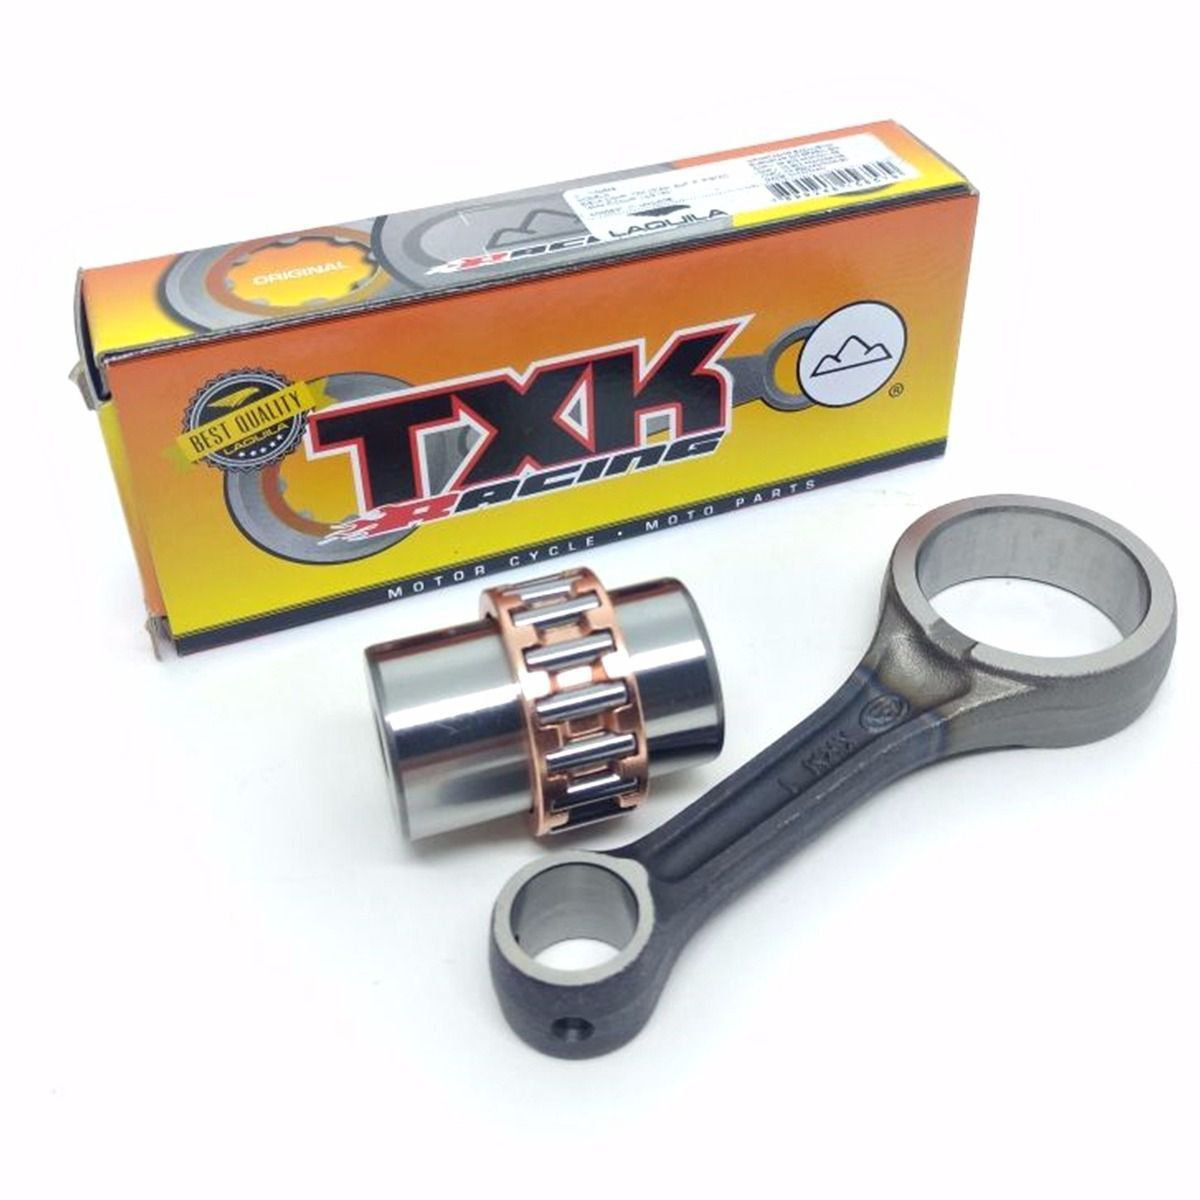 Biela Completa Txk Competição Pino 15mm Cg 150 Titan Fan Nxr Bros 150